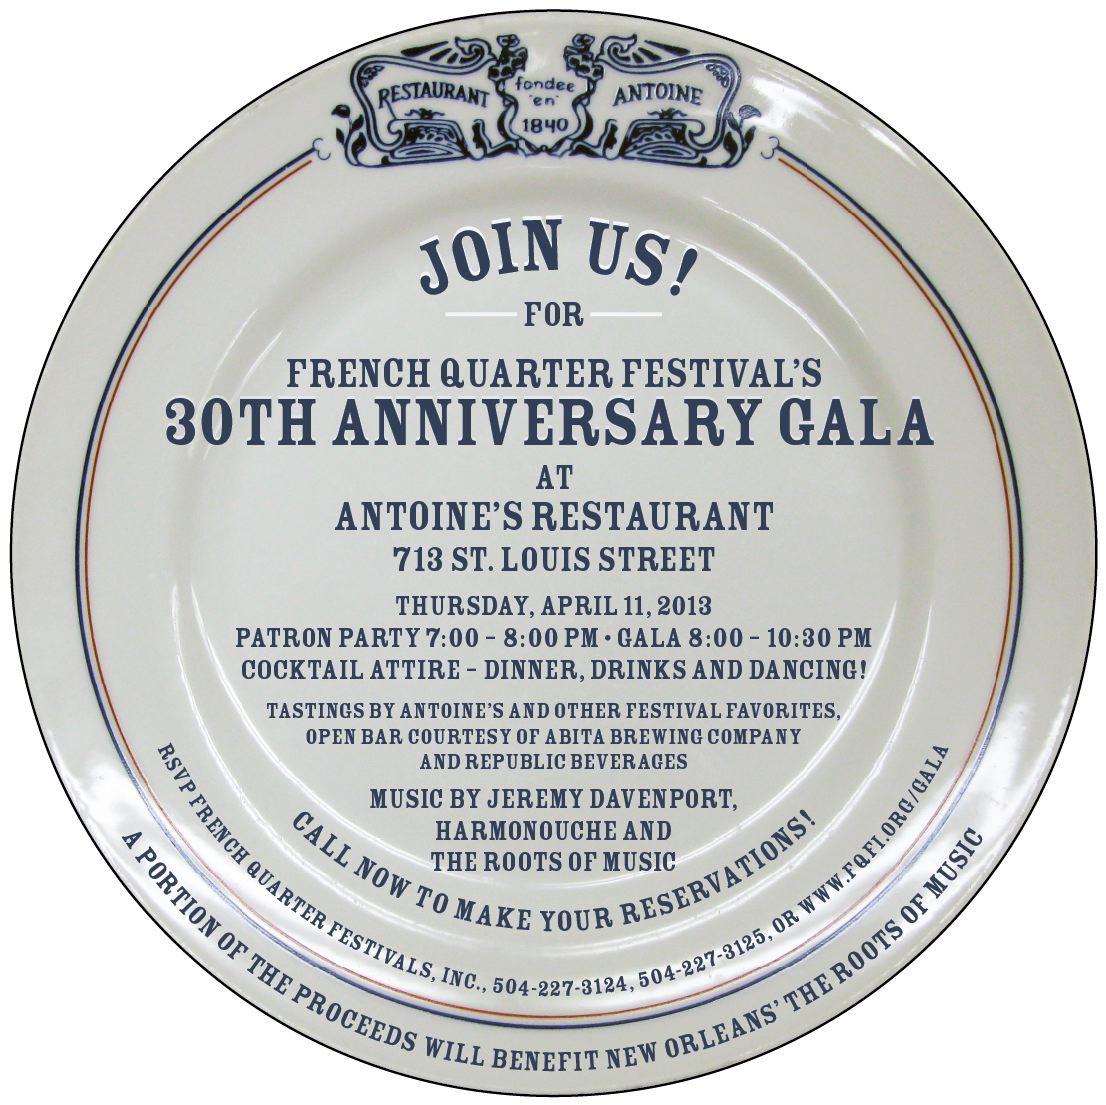 2013 FQF Gala Invitation